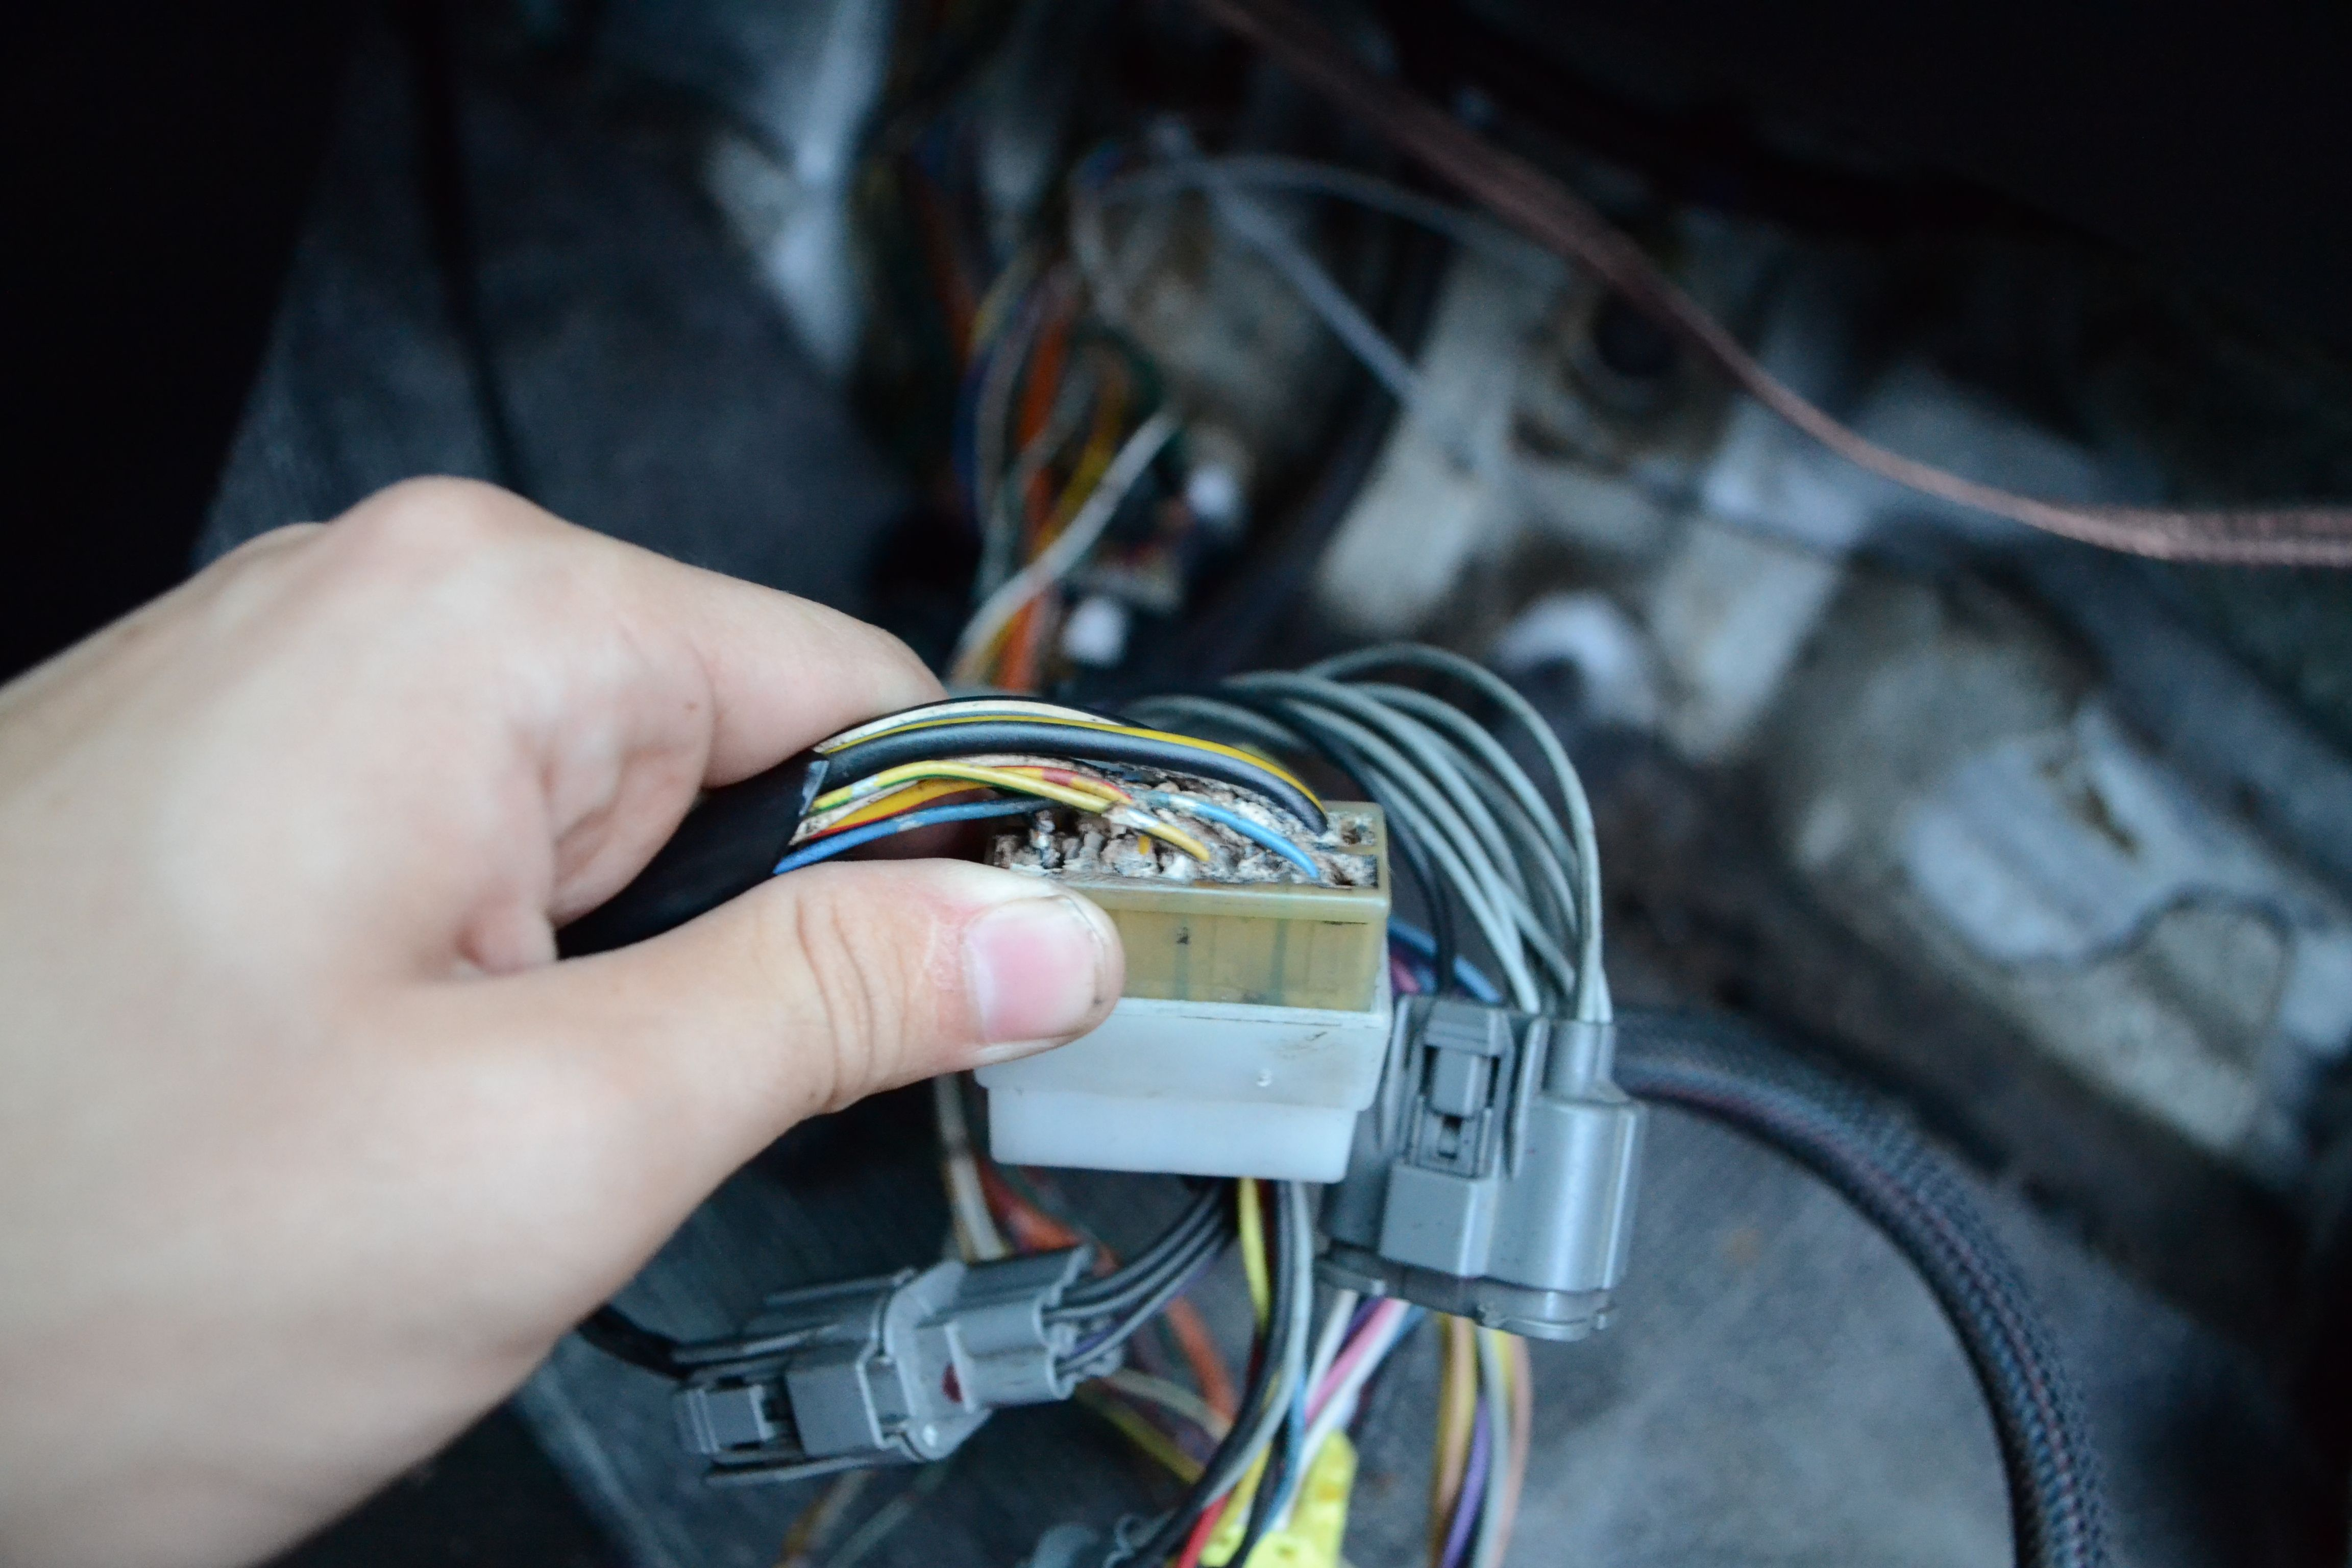 ECU wiring hack job | HondaSwap